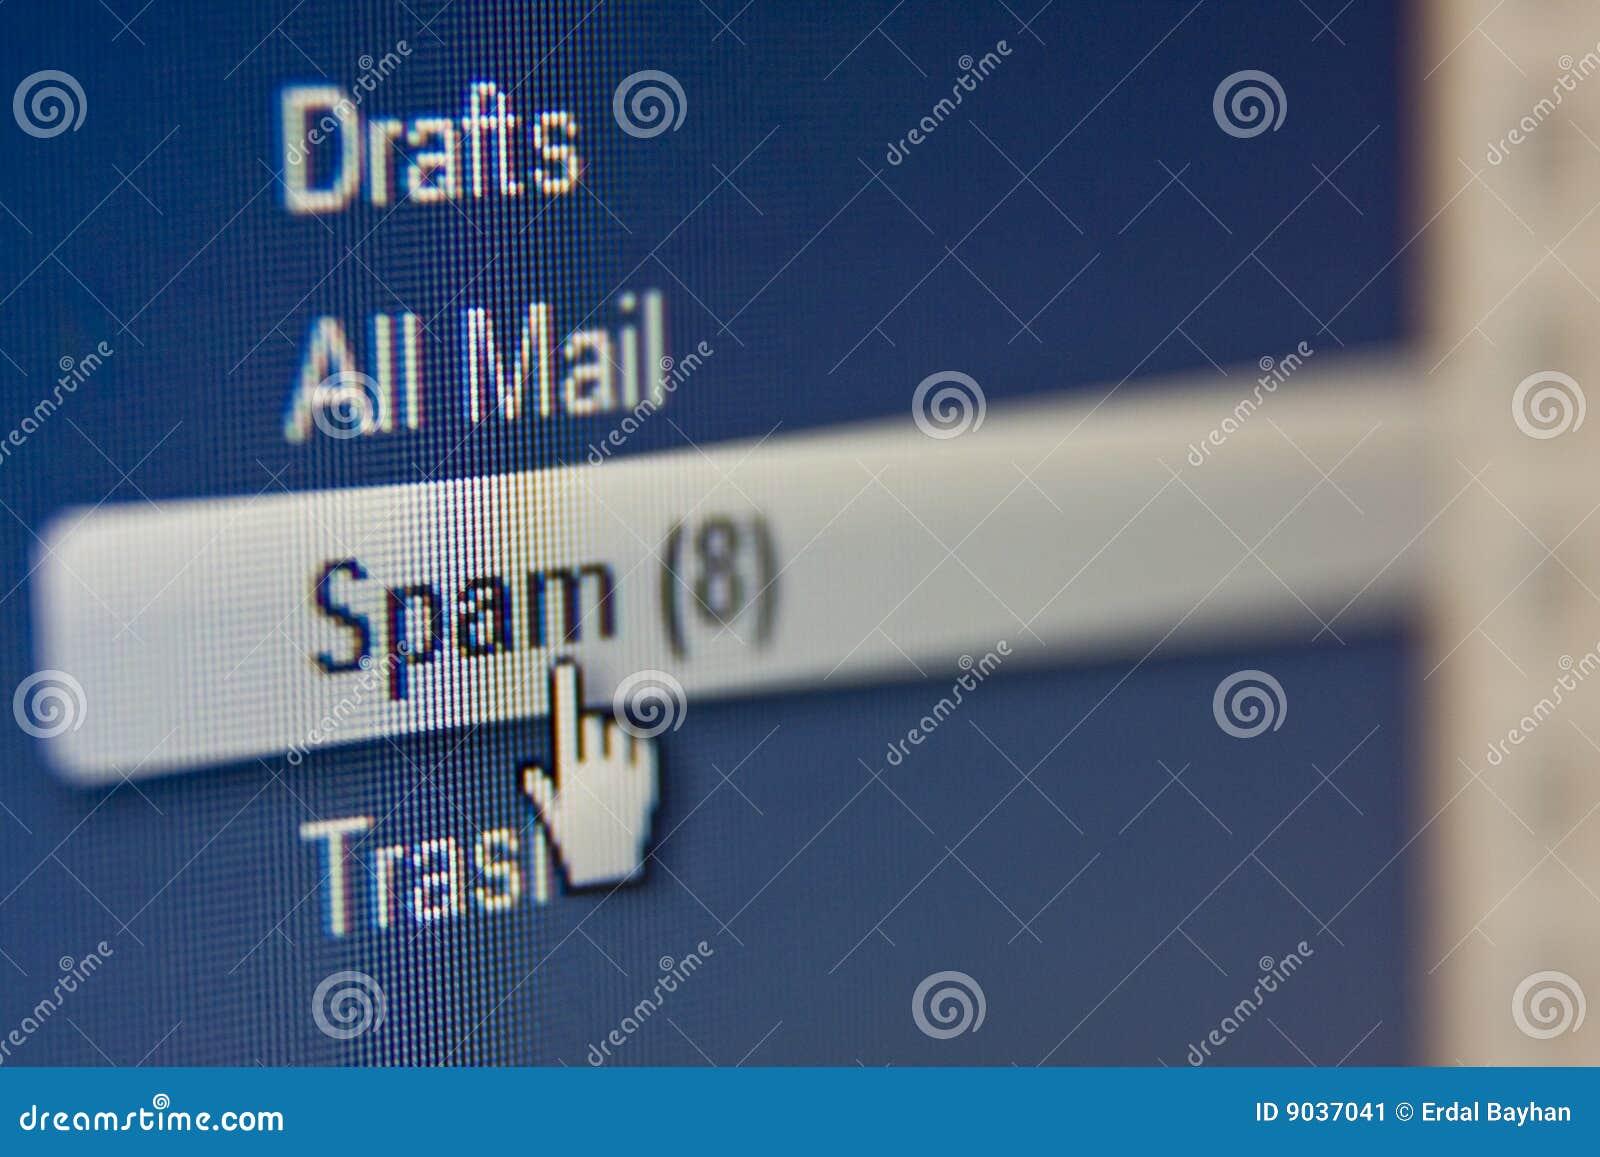 Warning! Spam